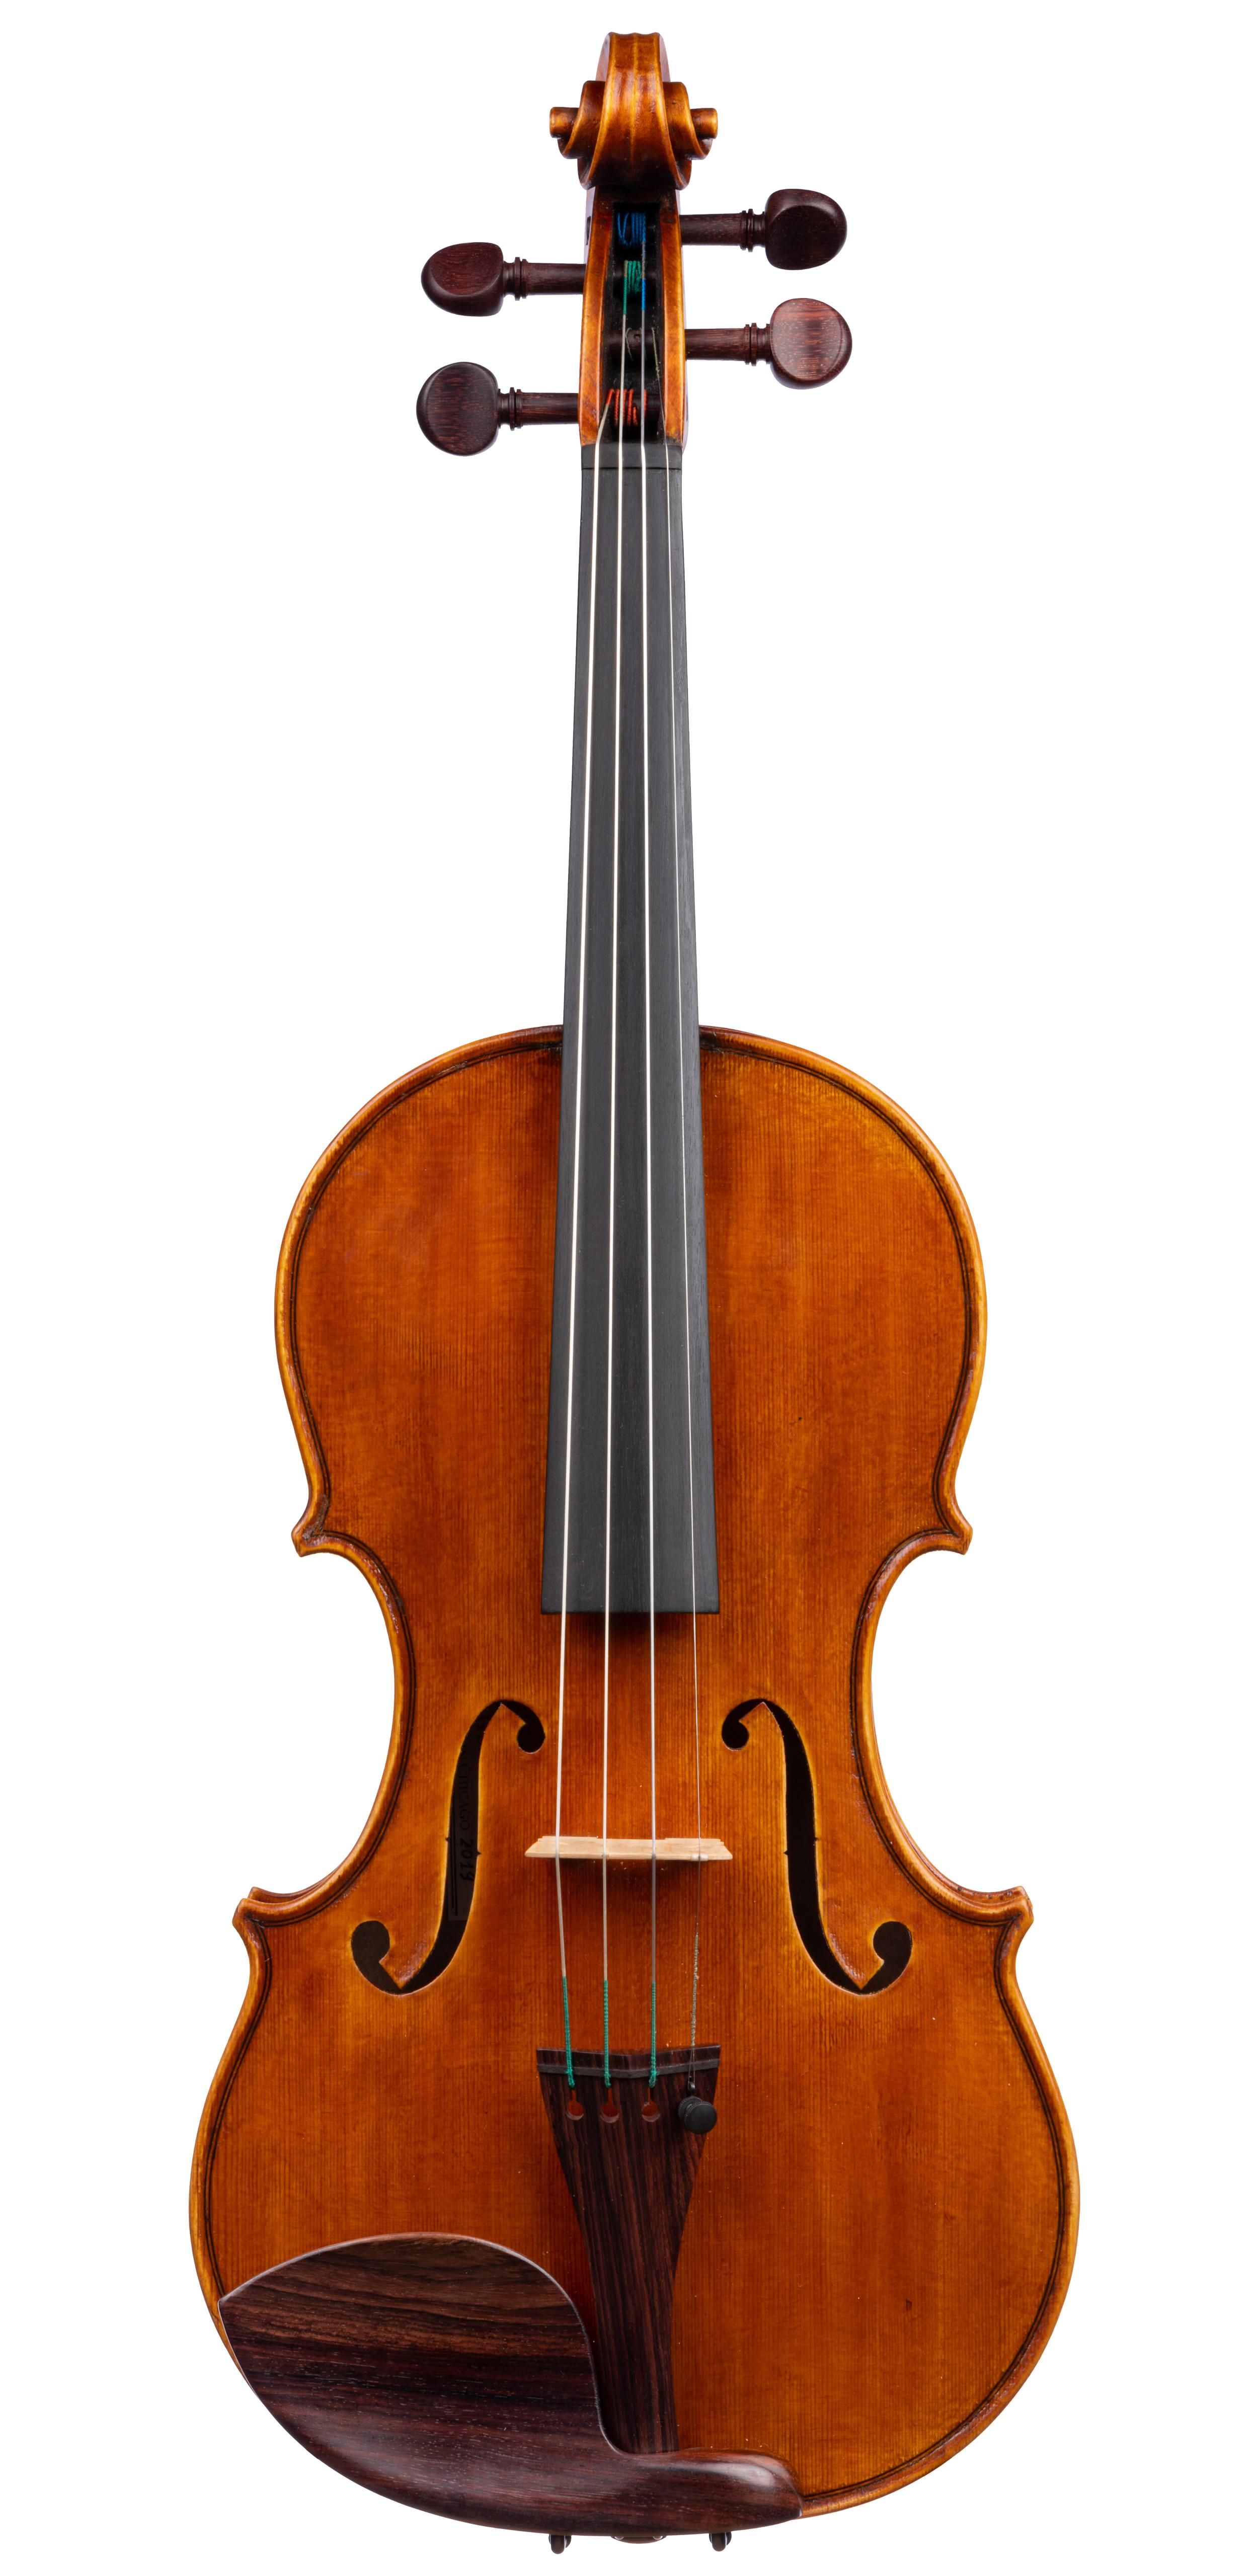 Noah Saunders Scott, Guarneri Model Violin, Chicago, 2019 - SOLD